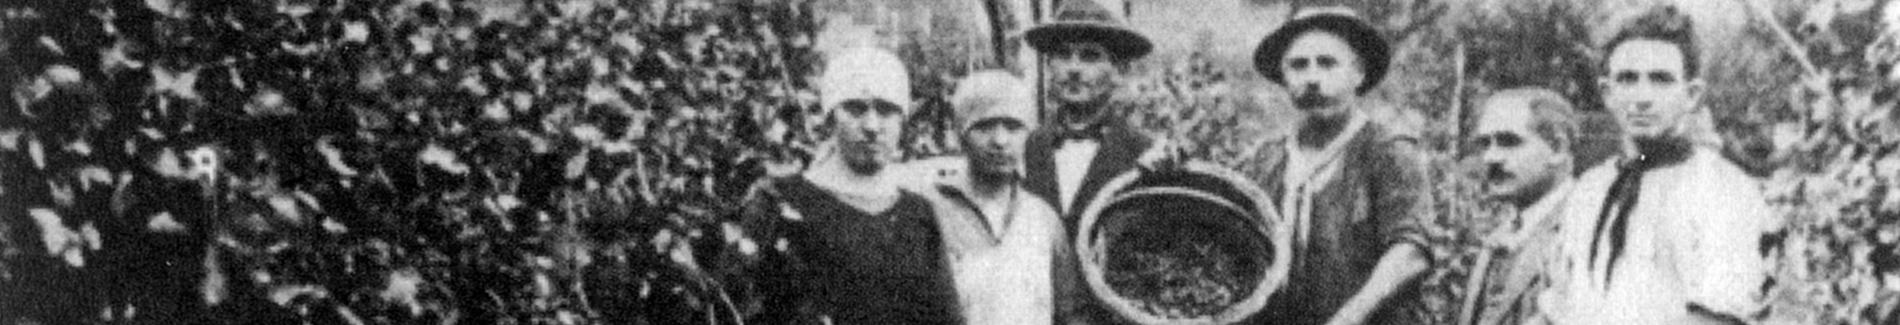 Vignaioli dal 1907: cantina in Oltrepò Pavese - Provincia di Pavia